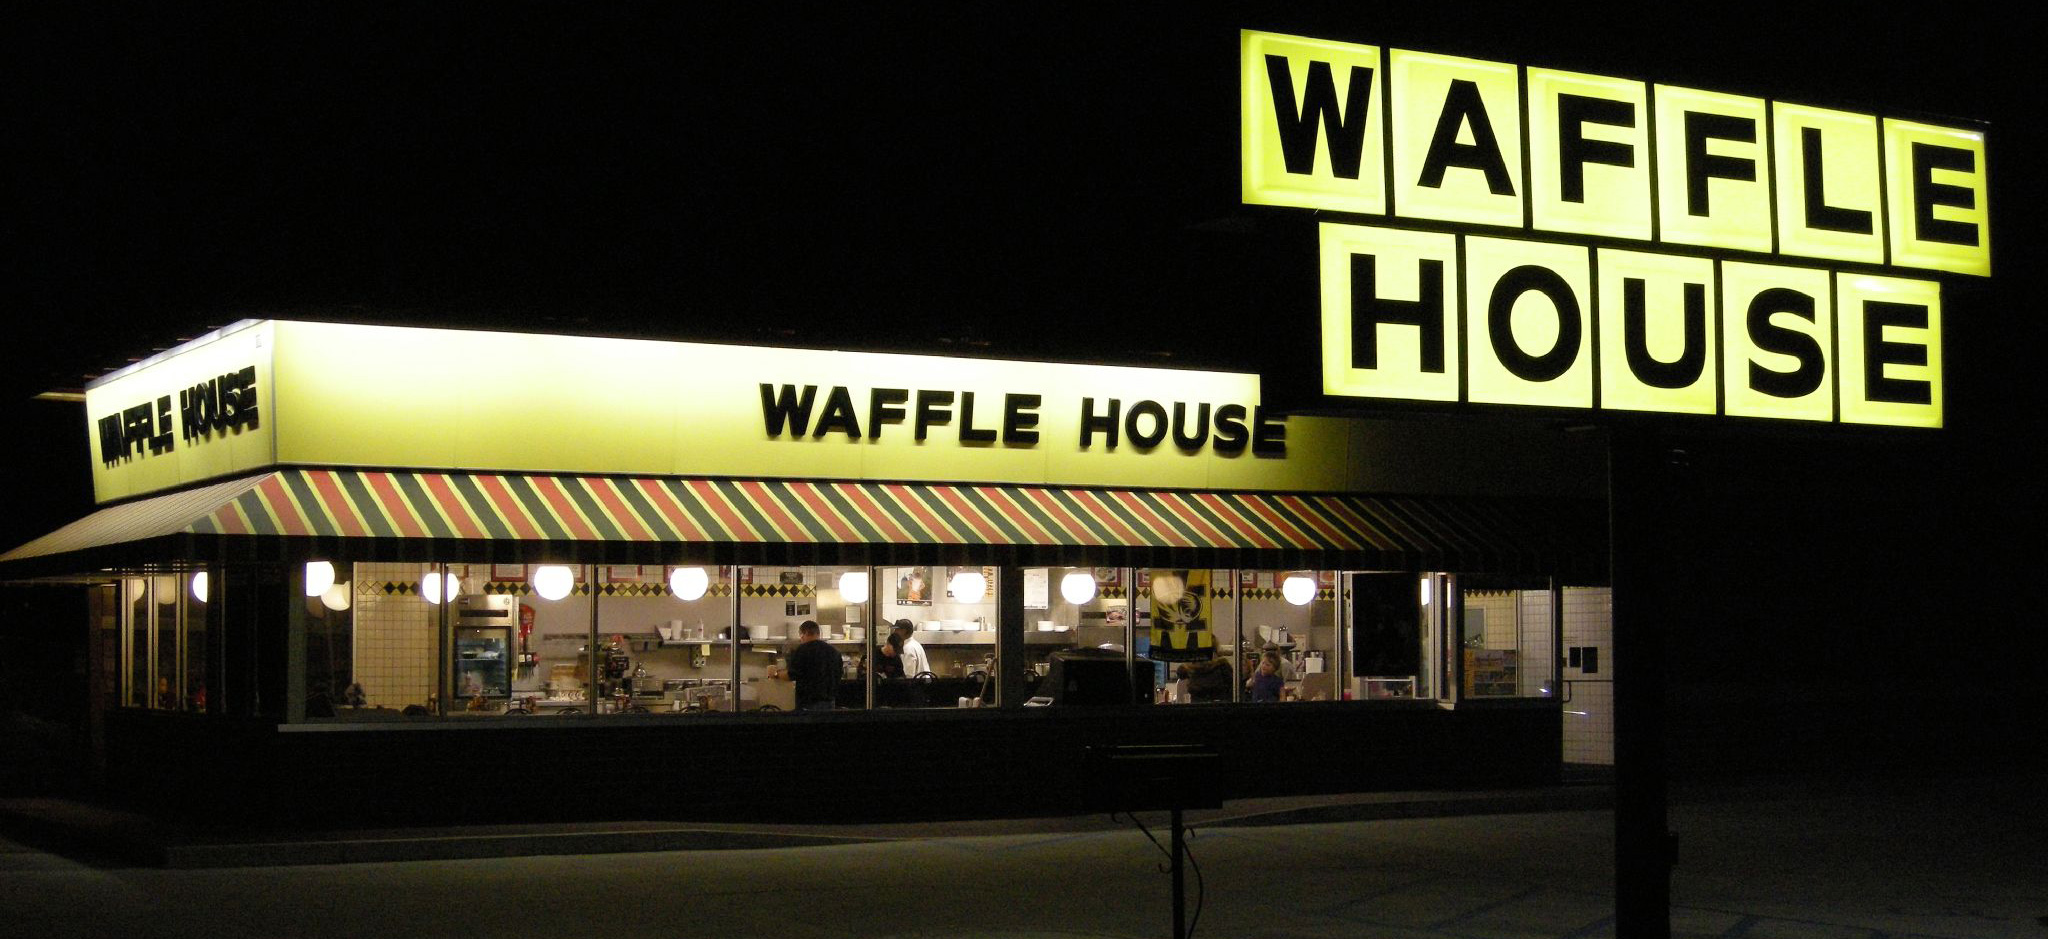 waffle house restaurant empty at night